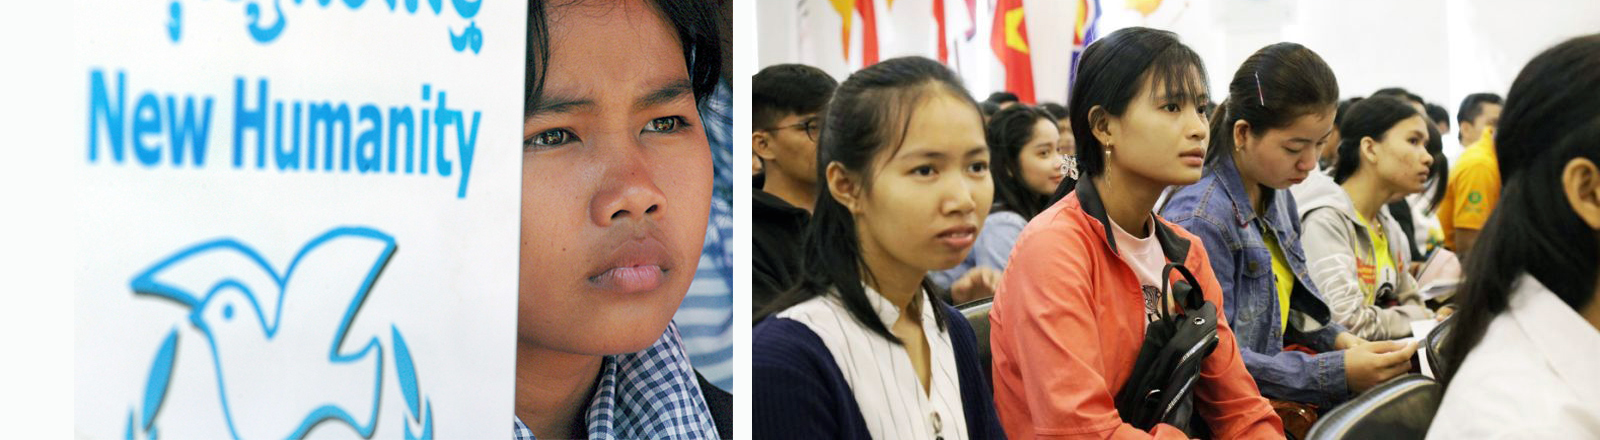 Junge Generation Kambodscha